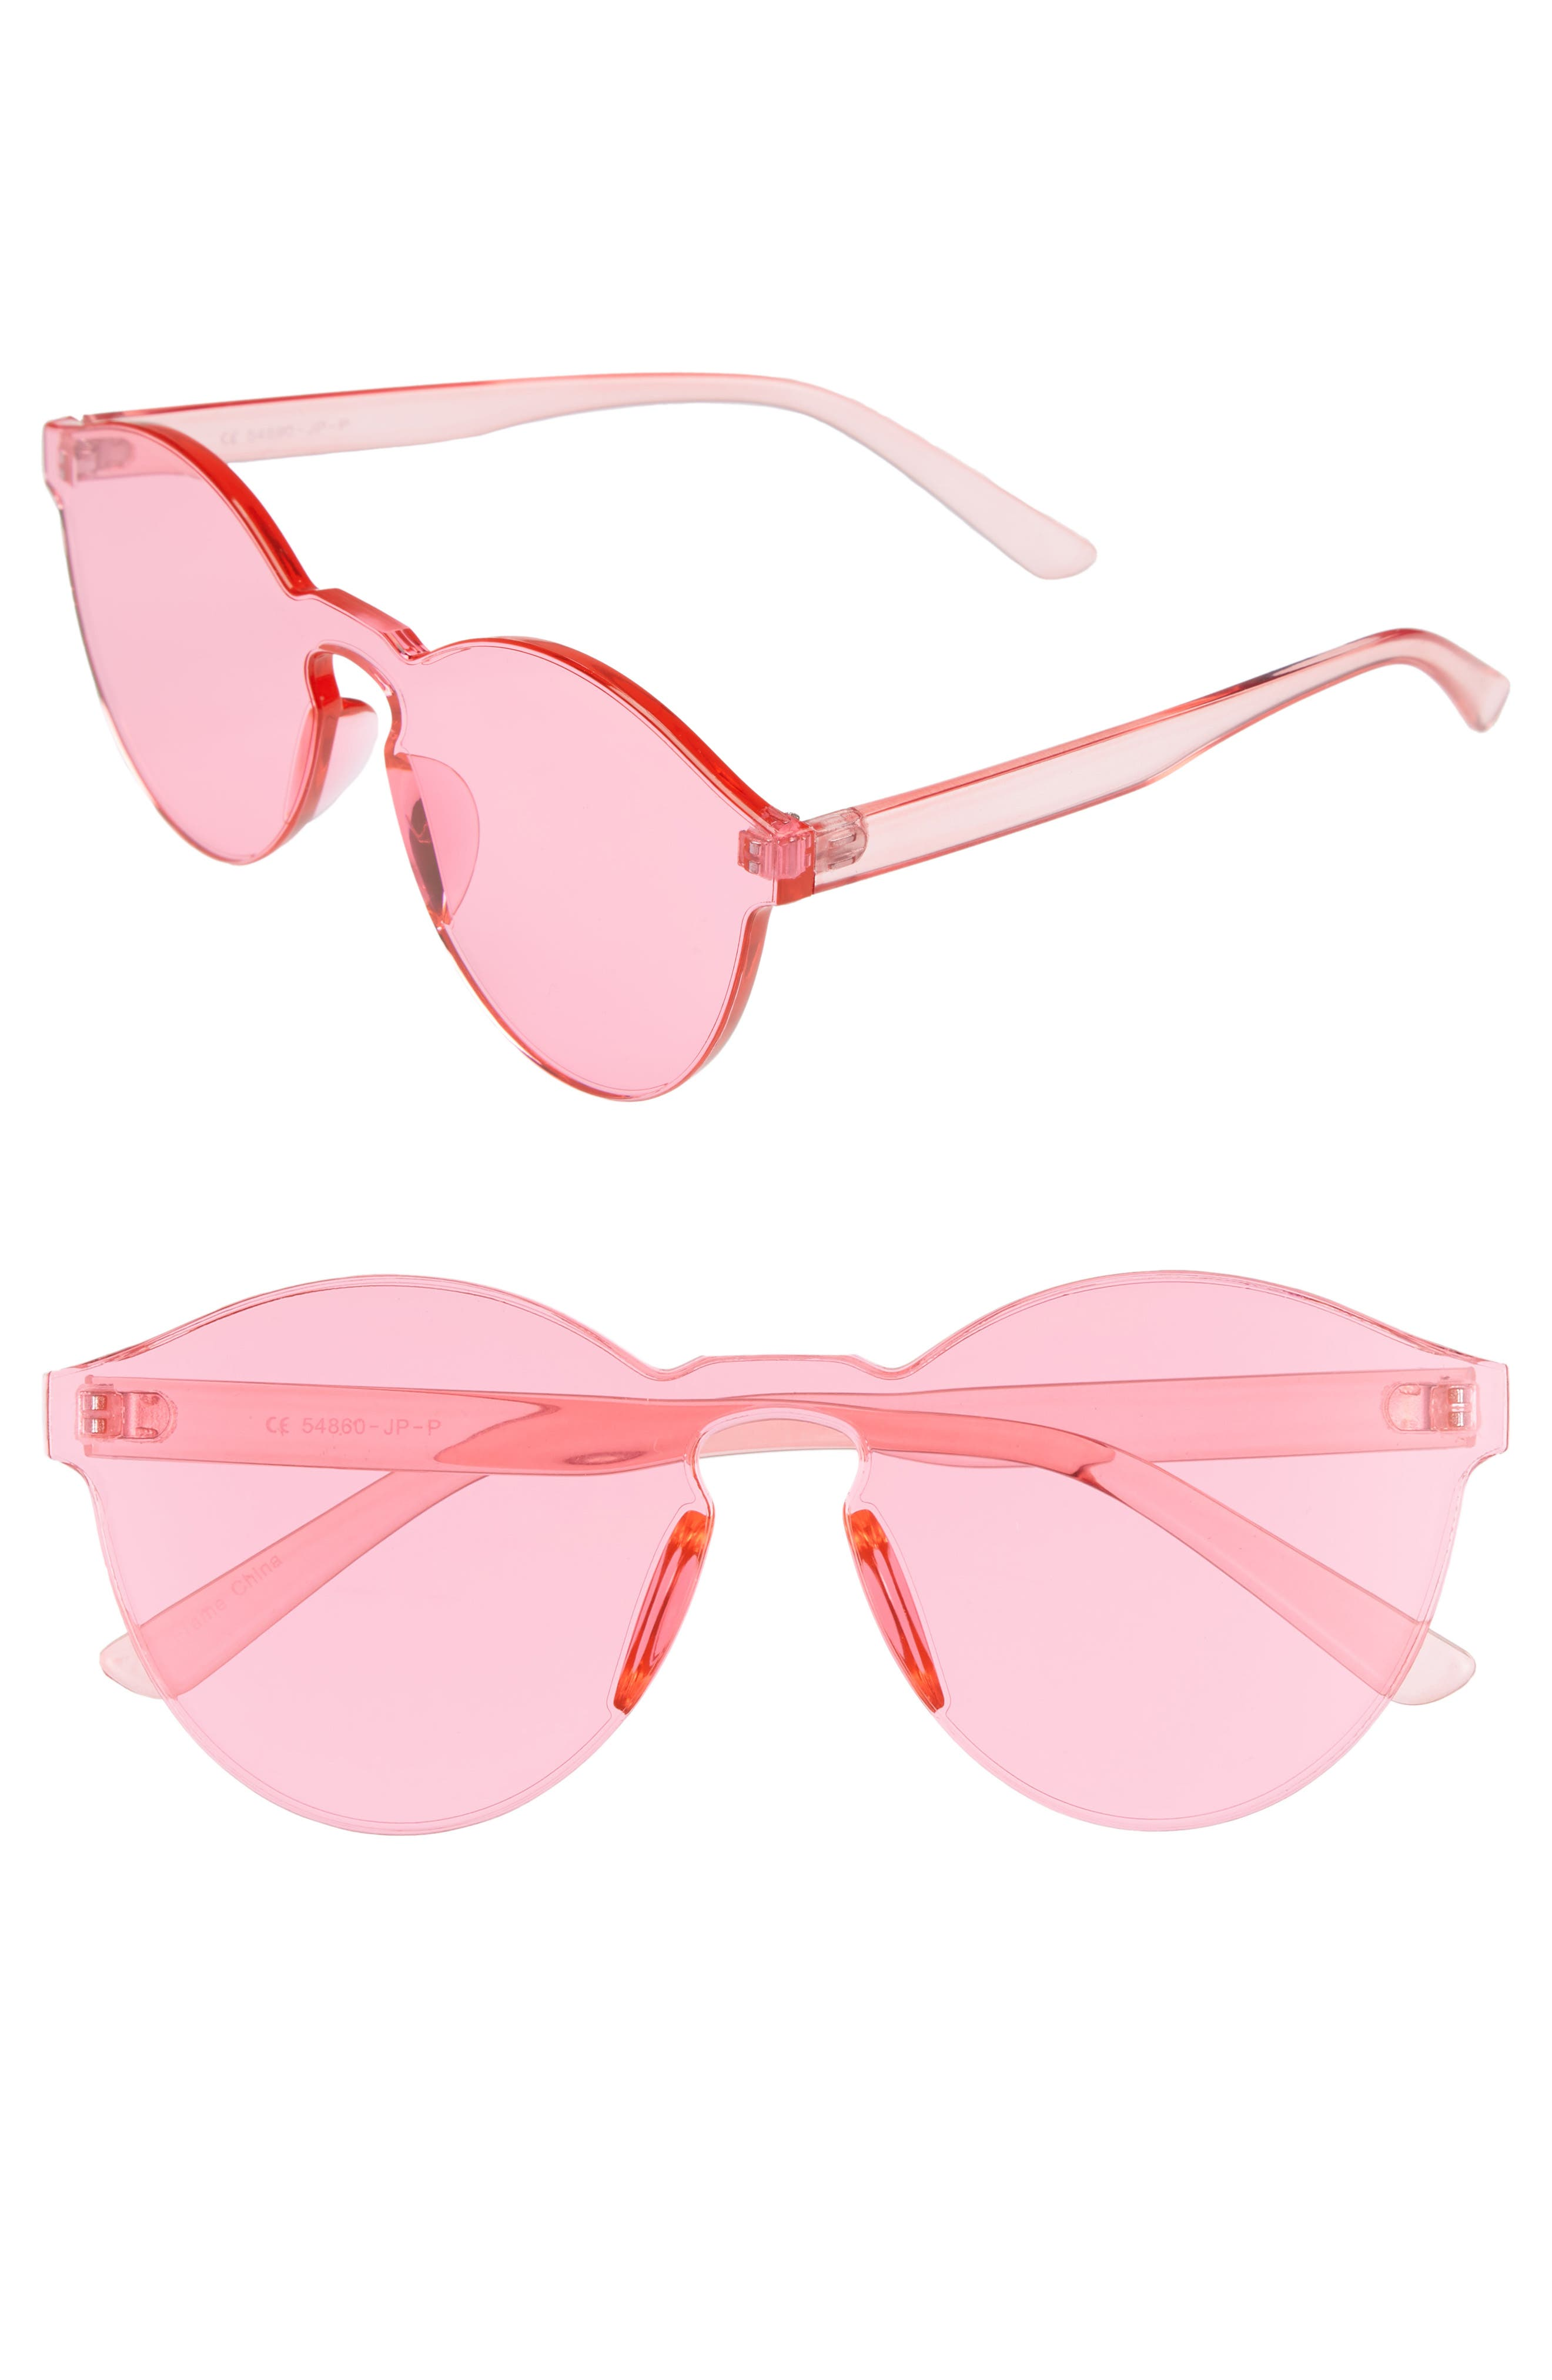 59mm Rimless Round Sunglasses,                             Main thumbnail 1, color,                             650